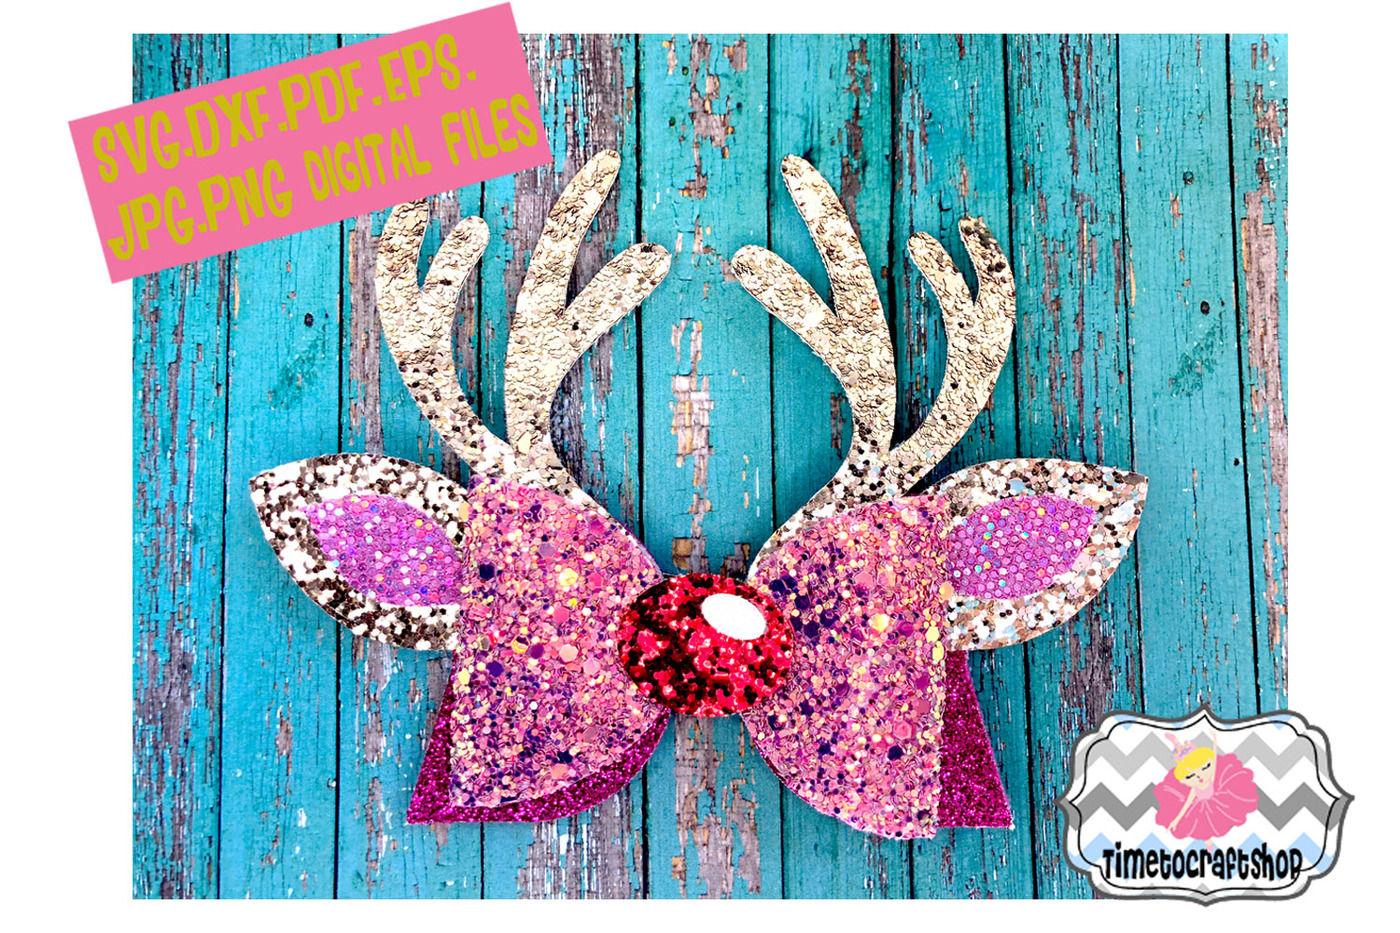 Reindeer Antler Hair Bow Template Svg Dxf Pdf Eps Jpg By